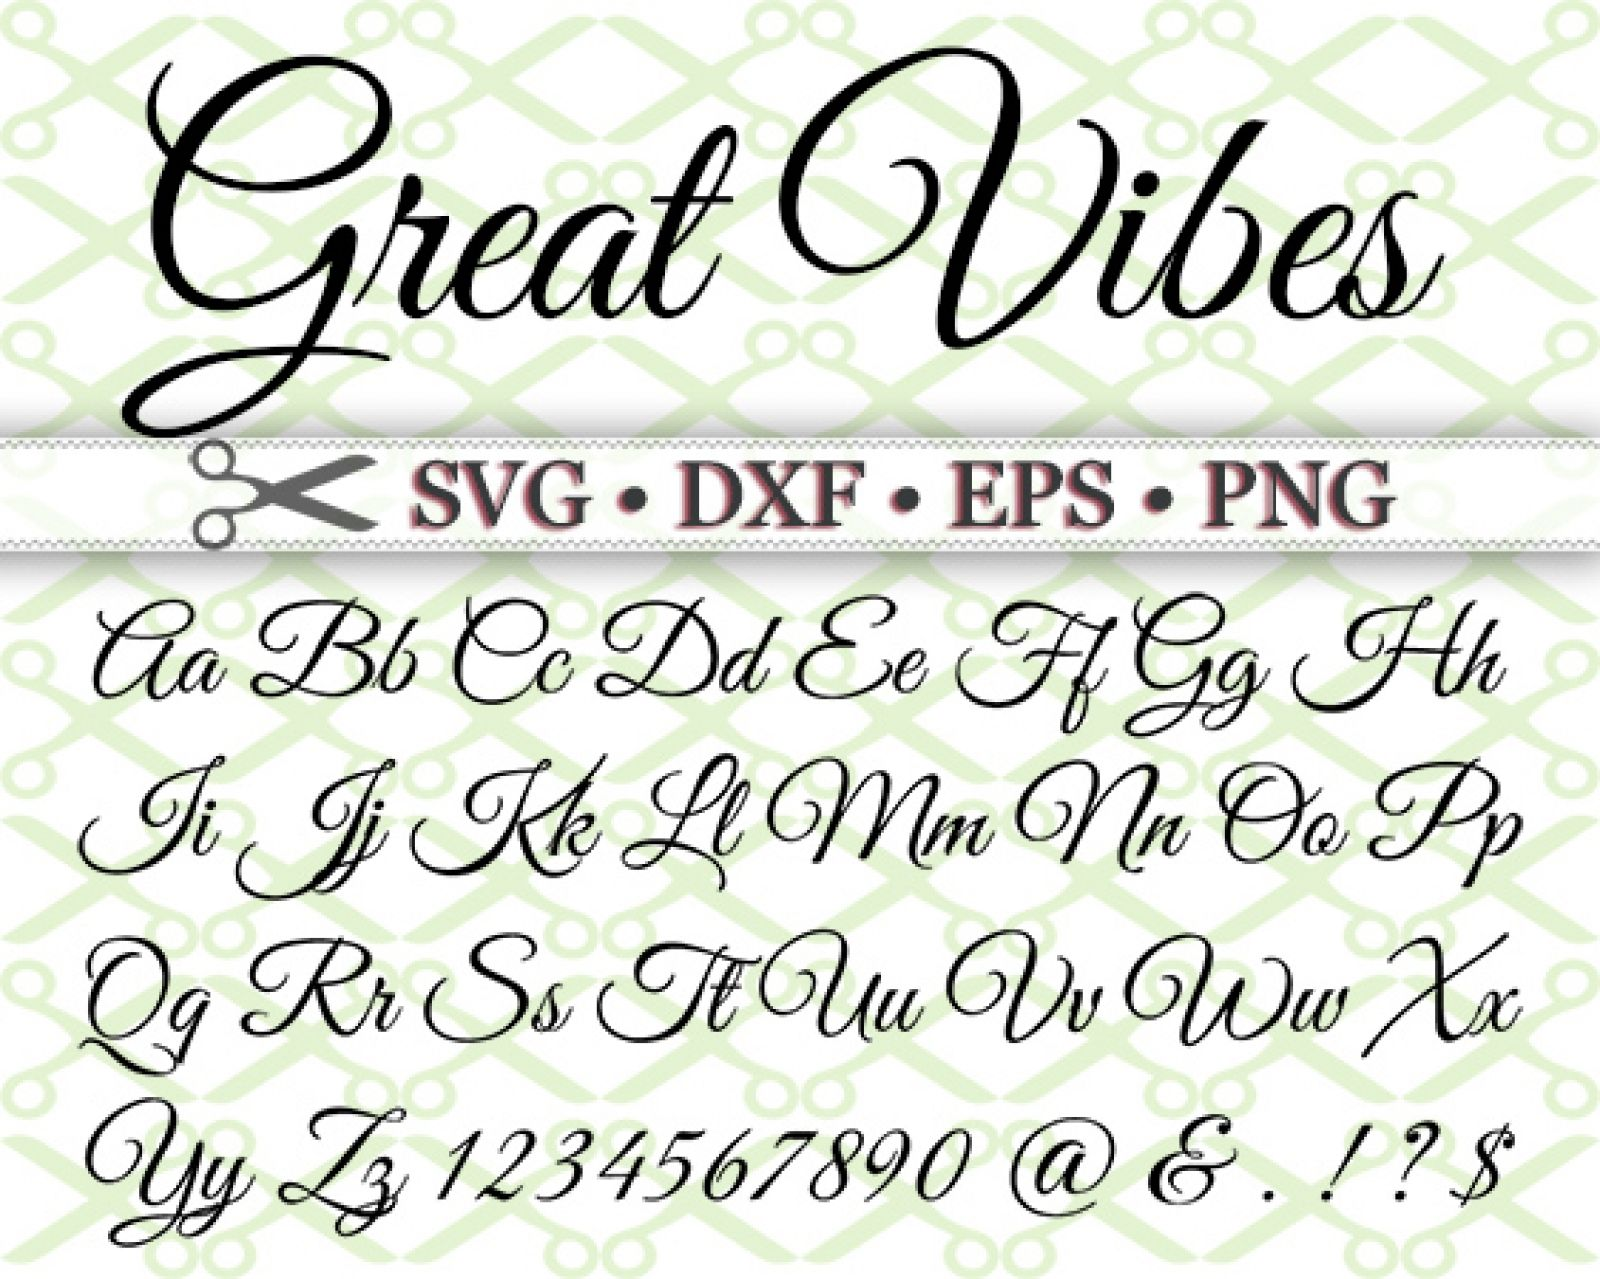 Great Vibes Svg Font Lettering Alphabet Lettering Fonts Hand Lettering Fonts